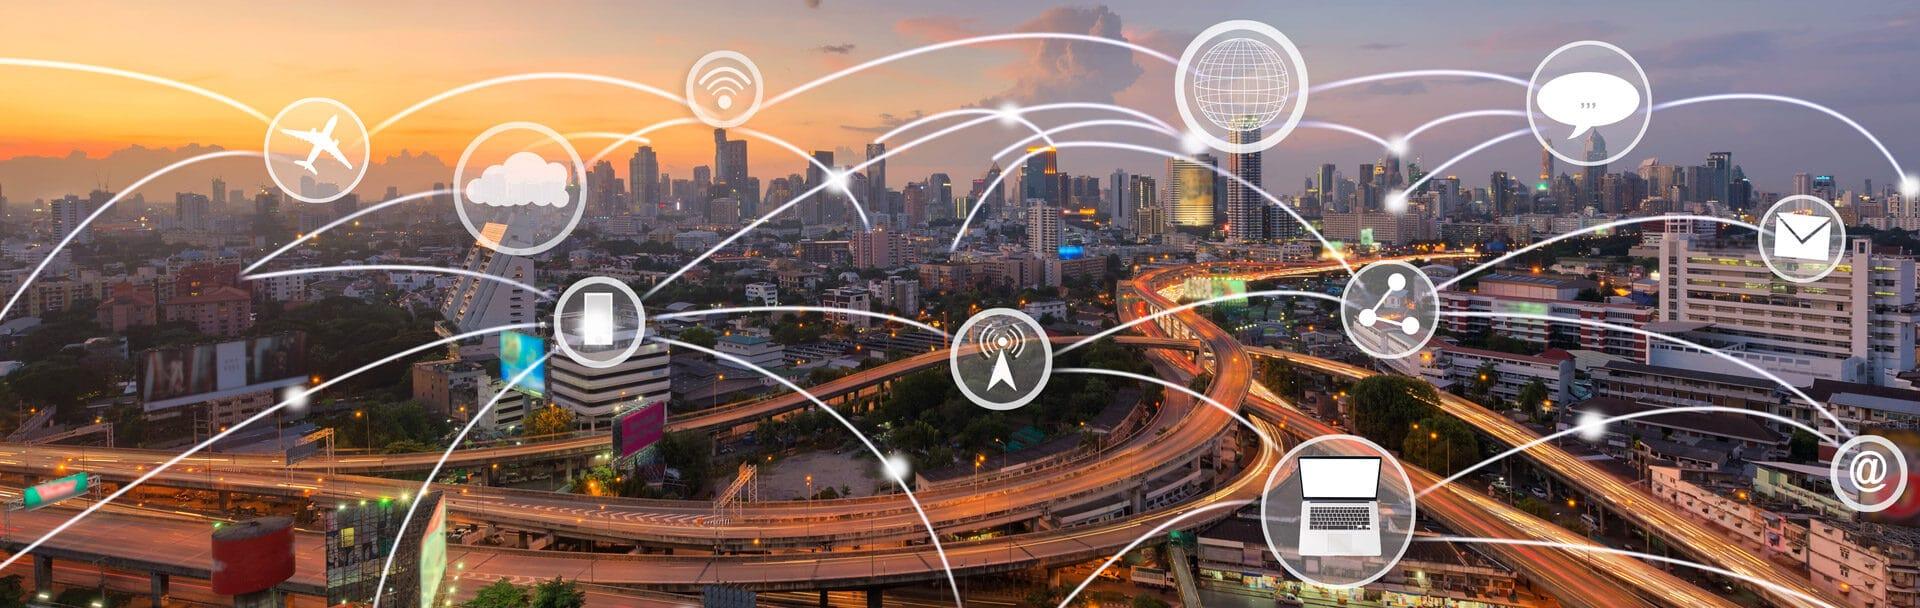 Big Data Expo 2018 - Future Facts